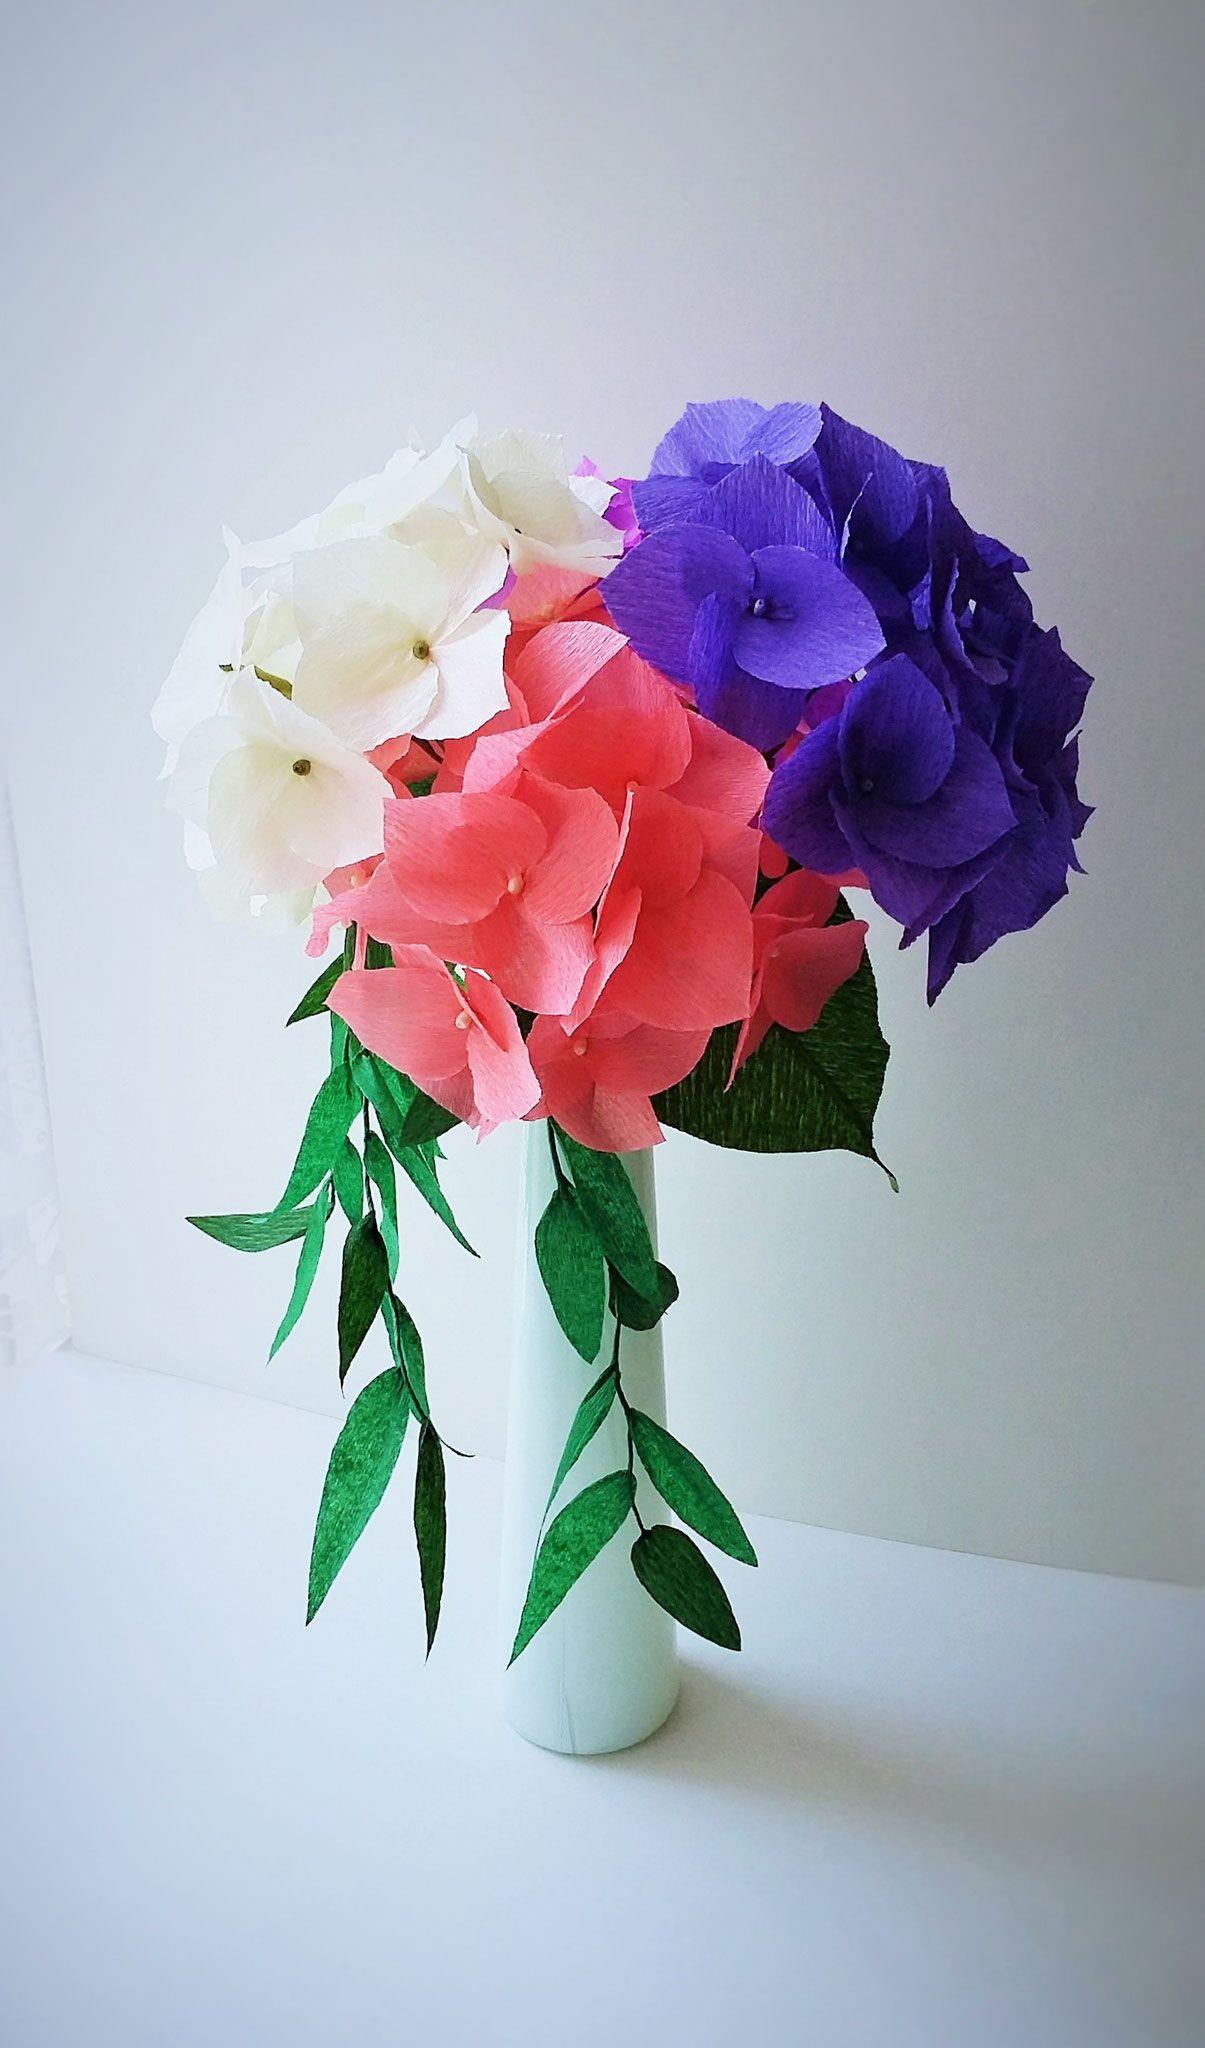 Romantic crepe paper hydrangea centerpiece handmade by amelis romantic crepe paper hydrangea centerpiece handmade by amelis lovely mightylinksfo